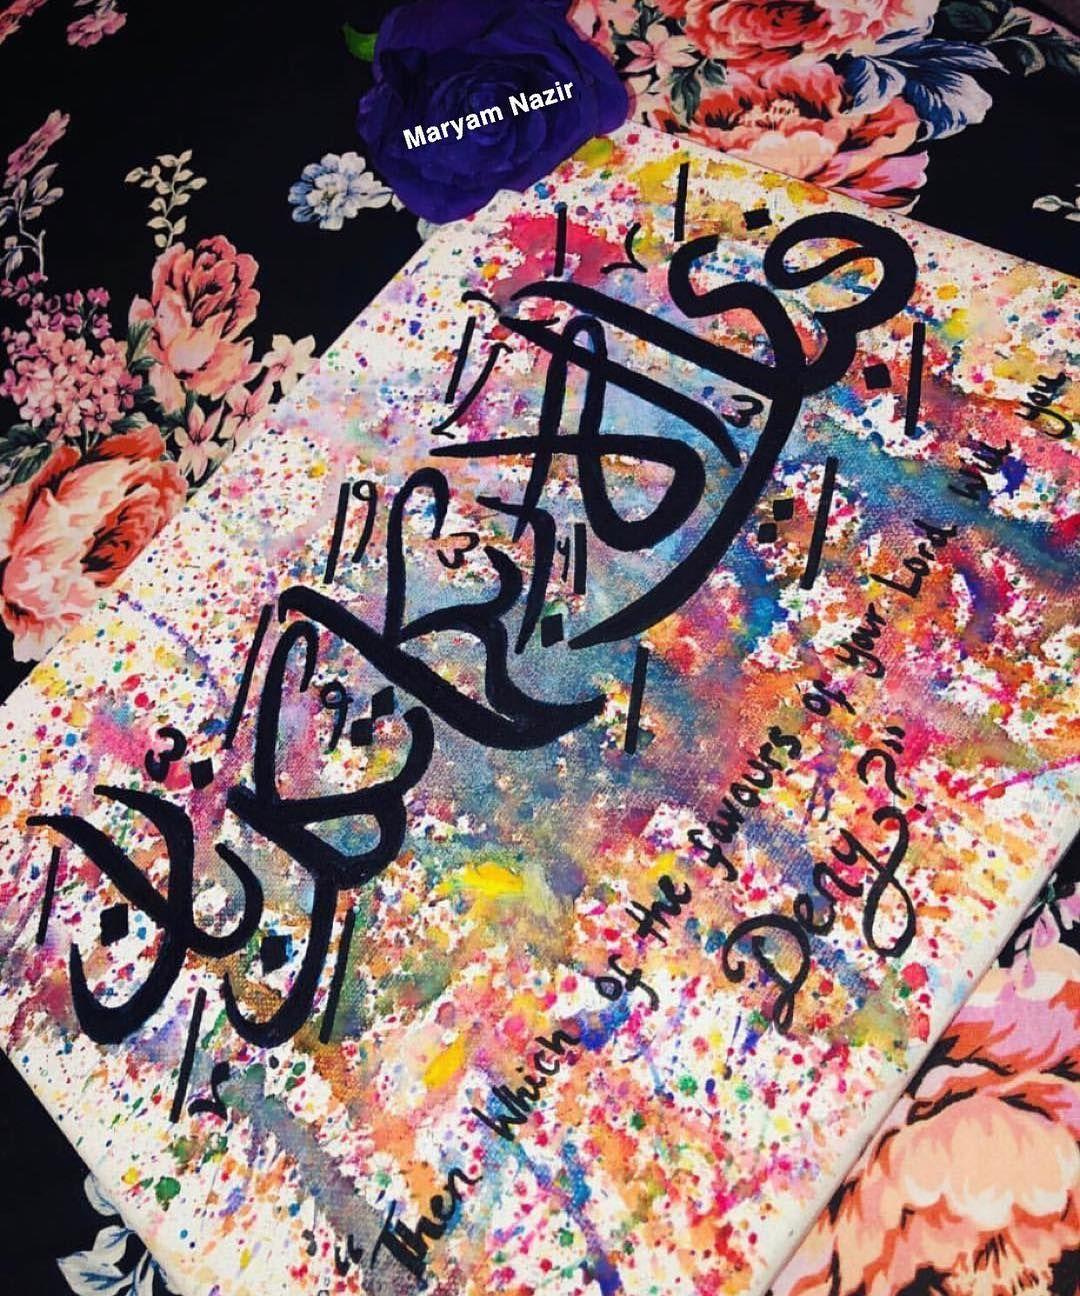 Fabiayyi Ala I Rabbikuma Tukadziban : fabiayyi, rabbikuma, tukadziban, Watch, YouTube, Videos, Online, Favourite, Ayahs, Quran, فبأ…, Islamic, Calligraphy, Painting,, Caligraphy, Painting